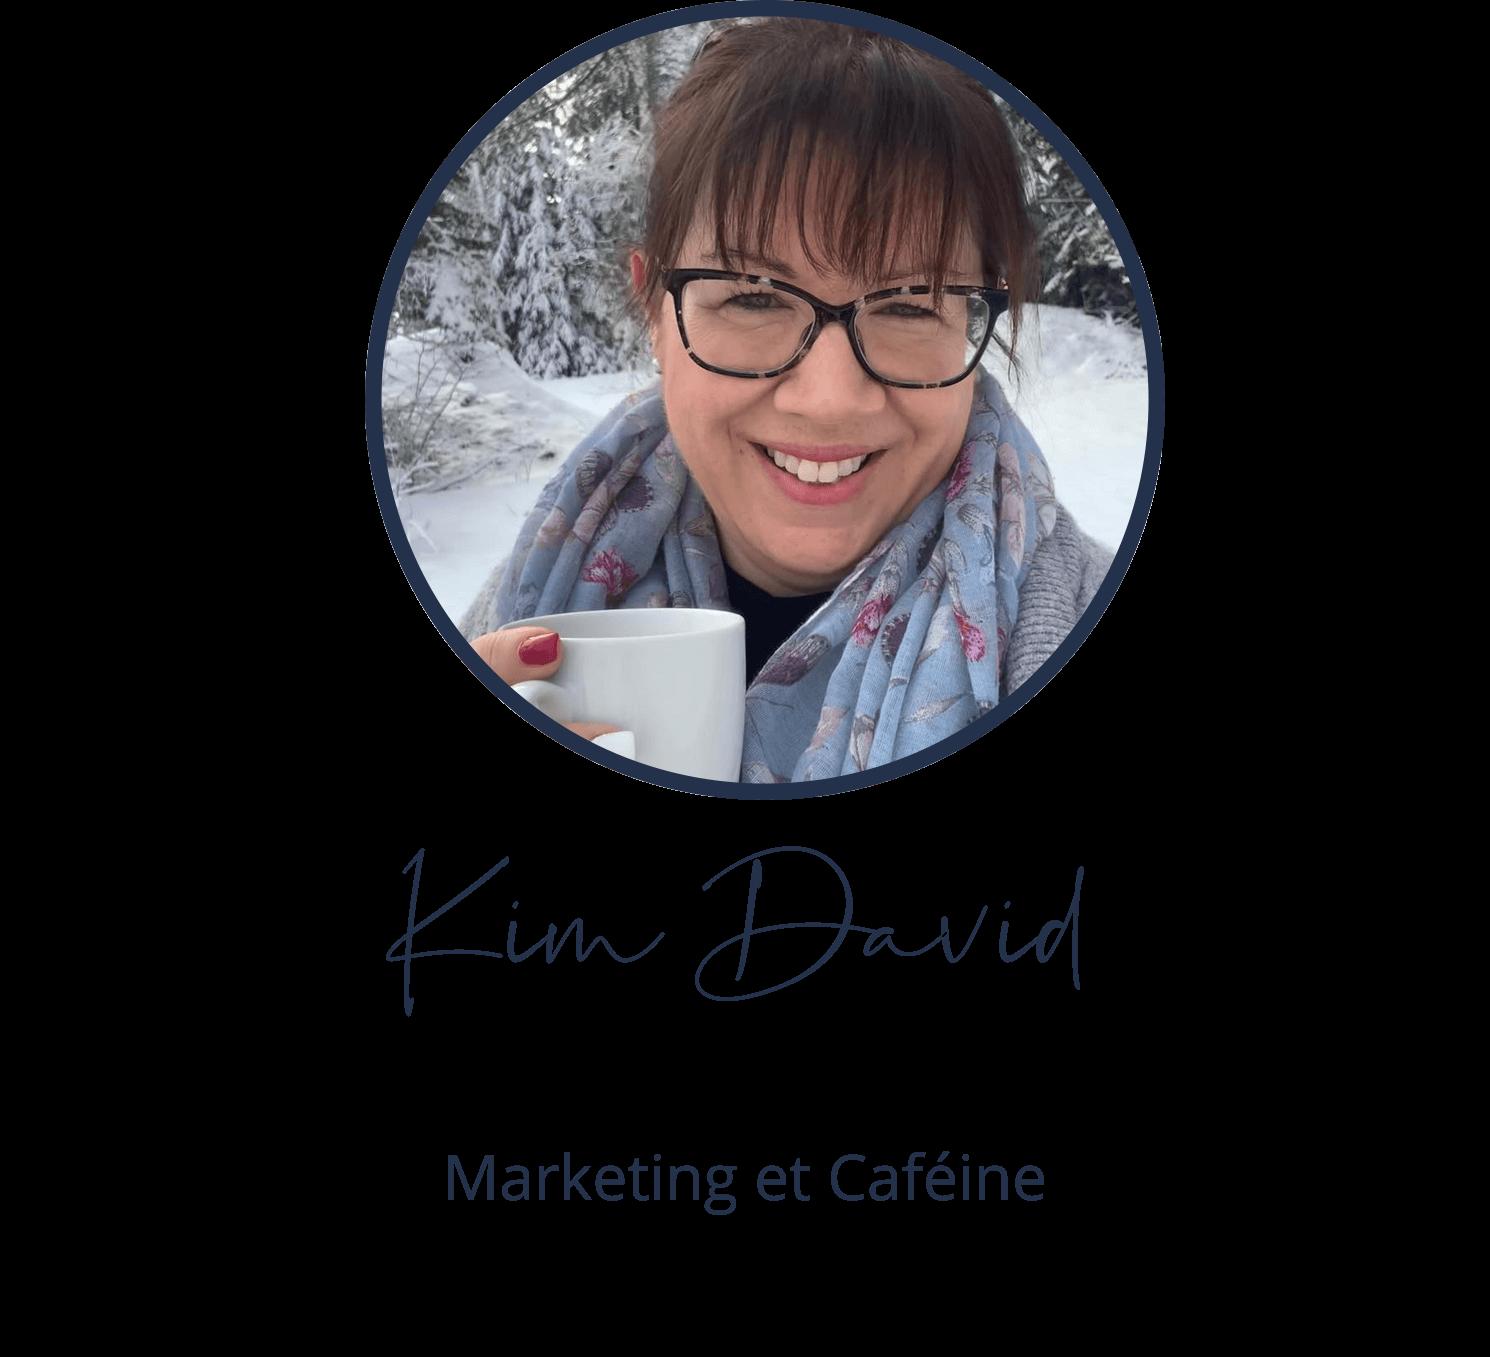 Kim David, Marketing et Caféine